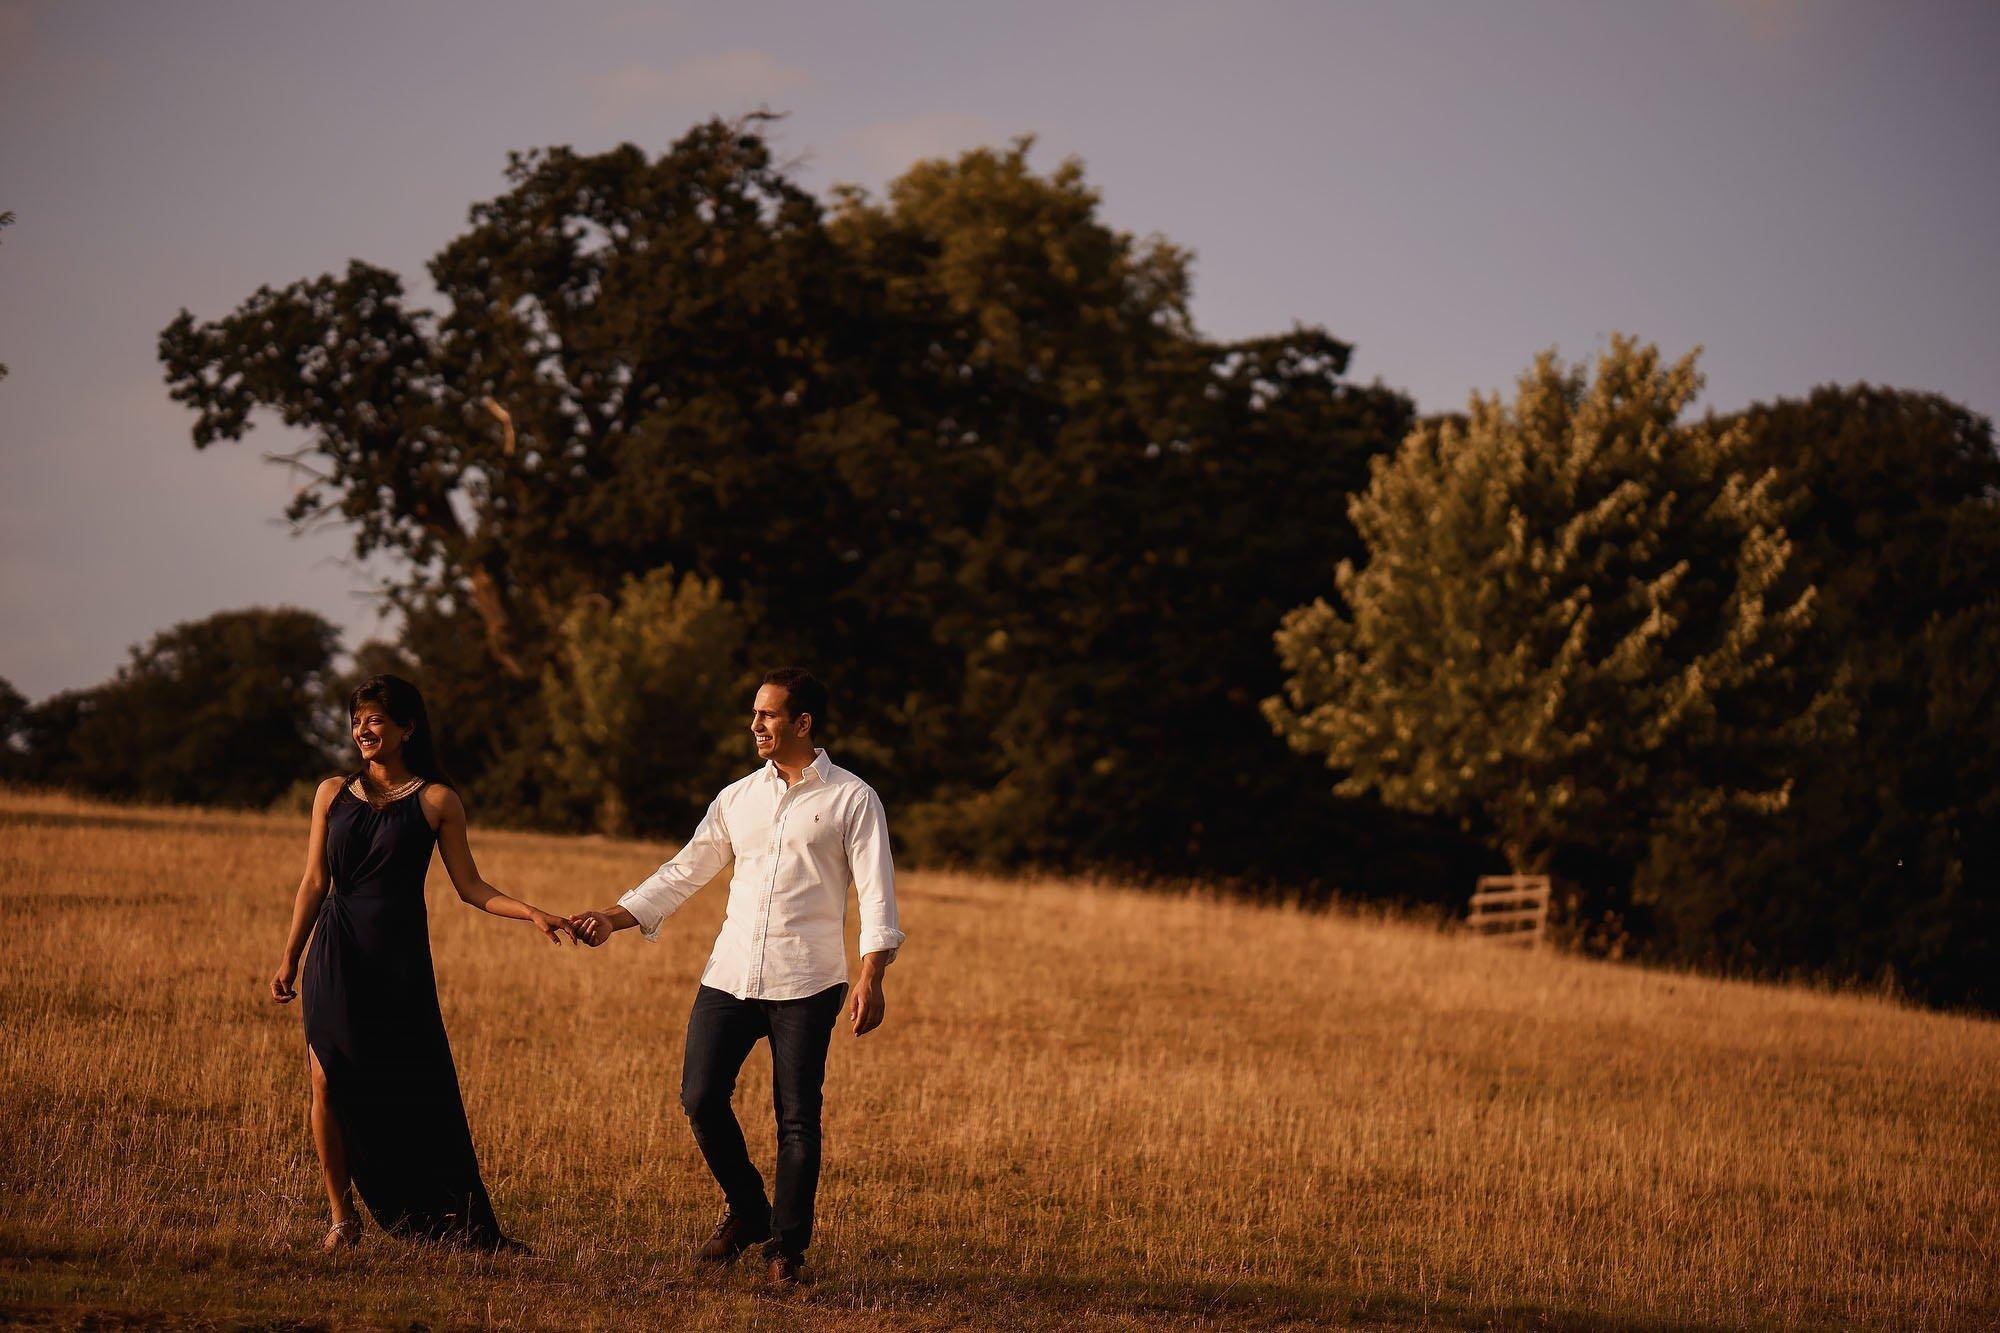 Bridwell Park Engagement Shoot - Wedding Photos at Bridwell Park Devon